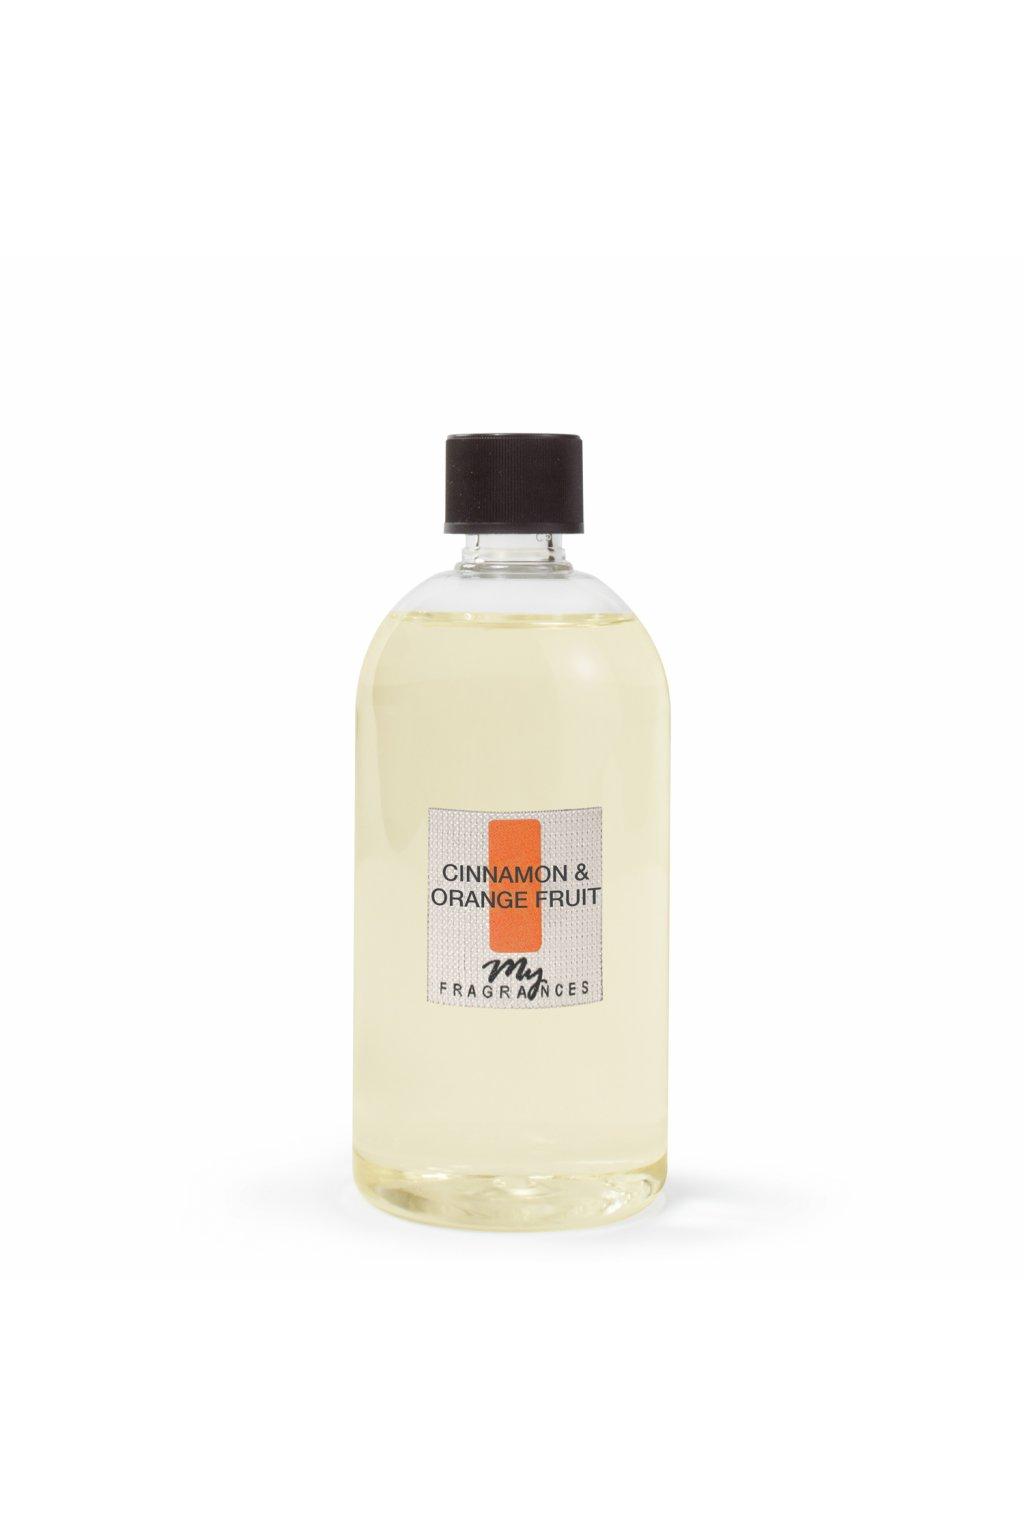 585 myf napln pro aromaticky difuzer cinnnamon orange fruit skorice a pomeranc 500ml